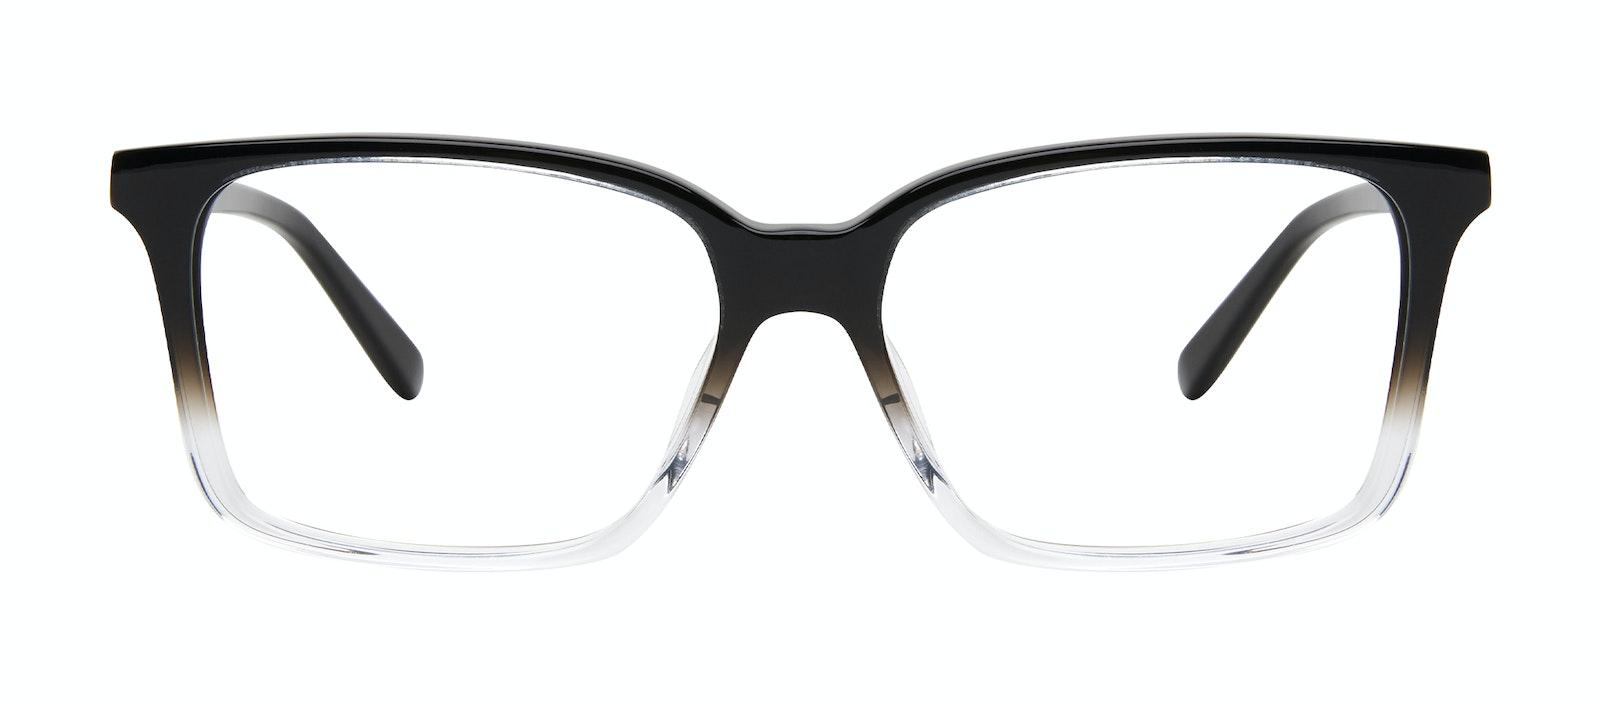 Affordable Fashion Glasses Square Eyeglasses Men Lapel XL Onyx Clear Front